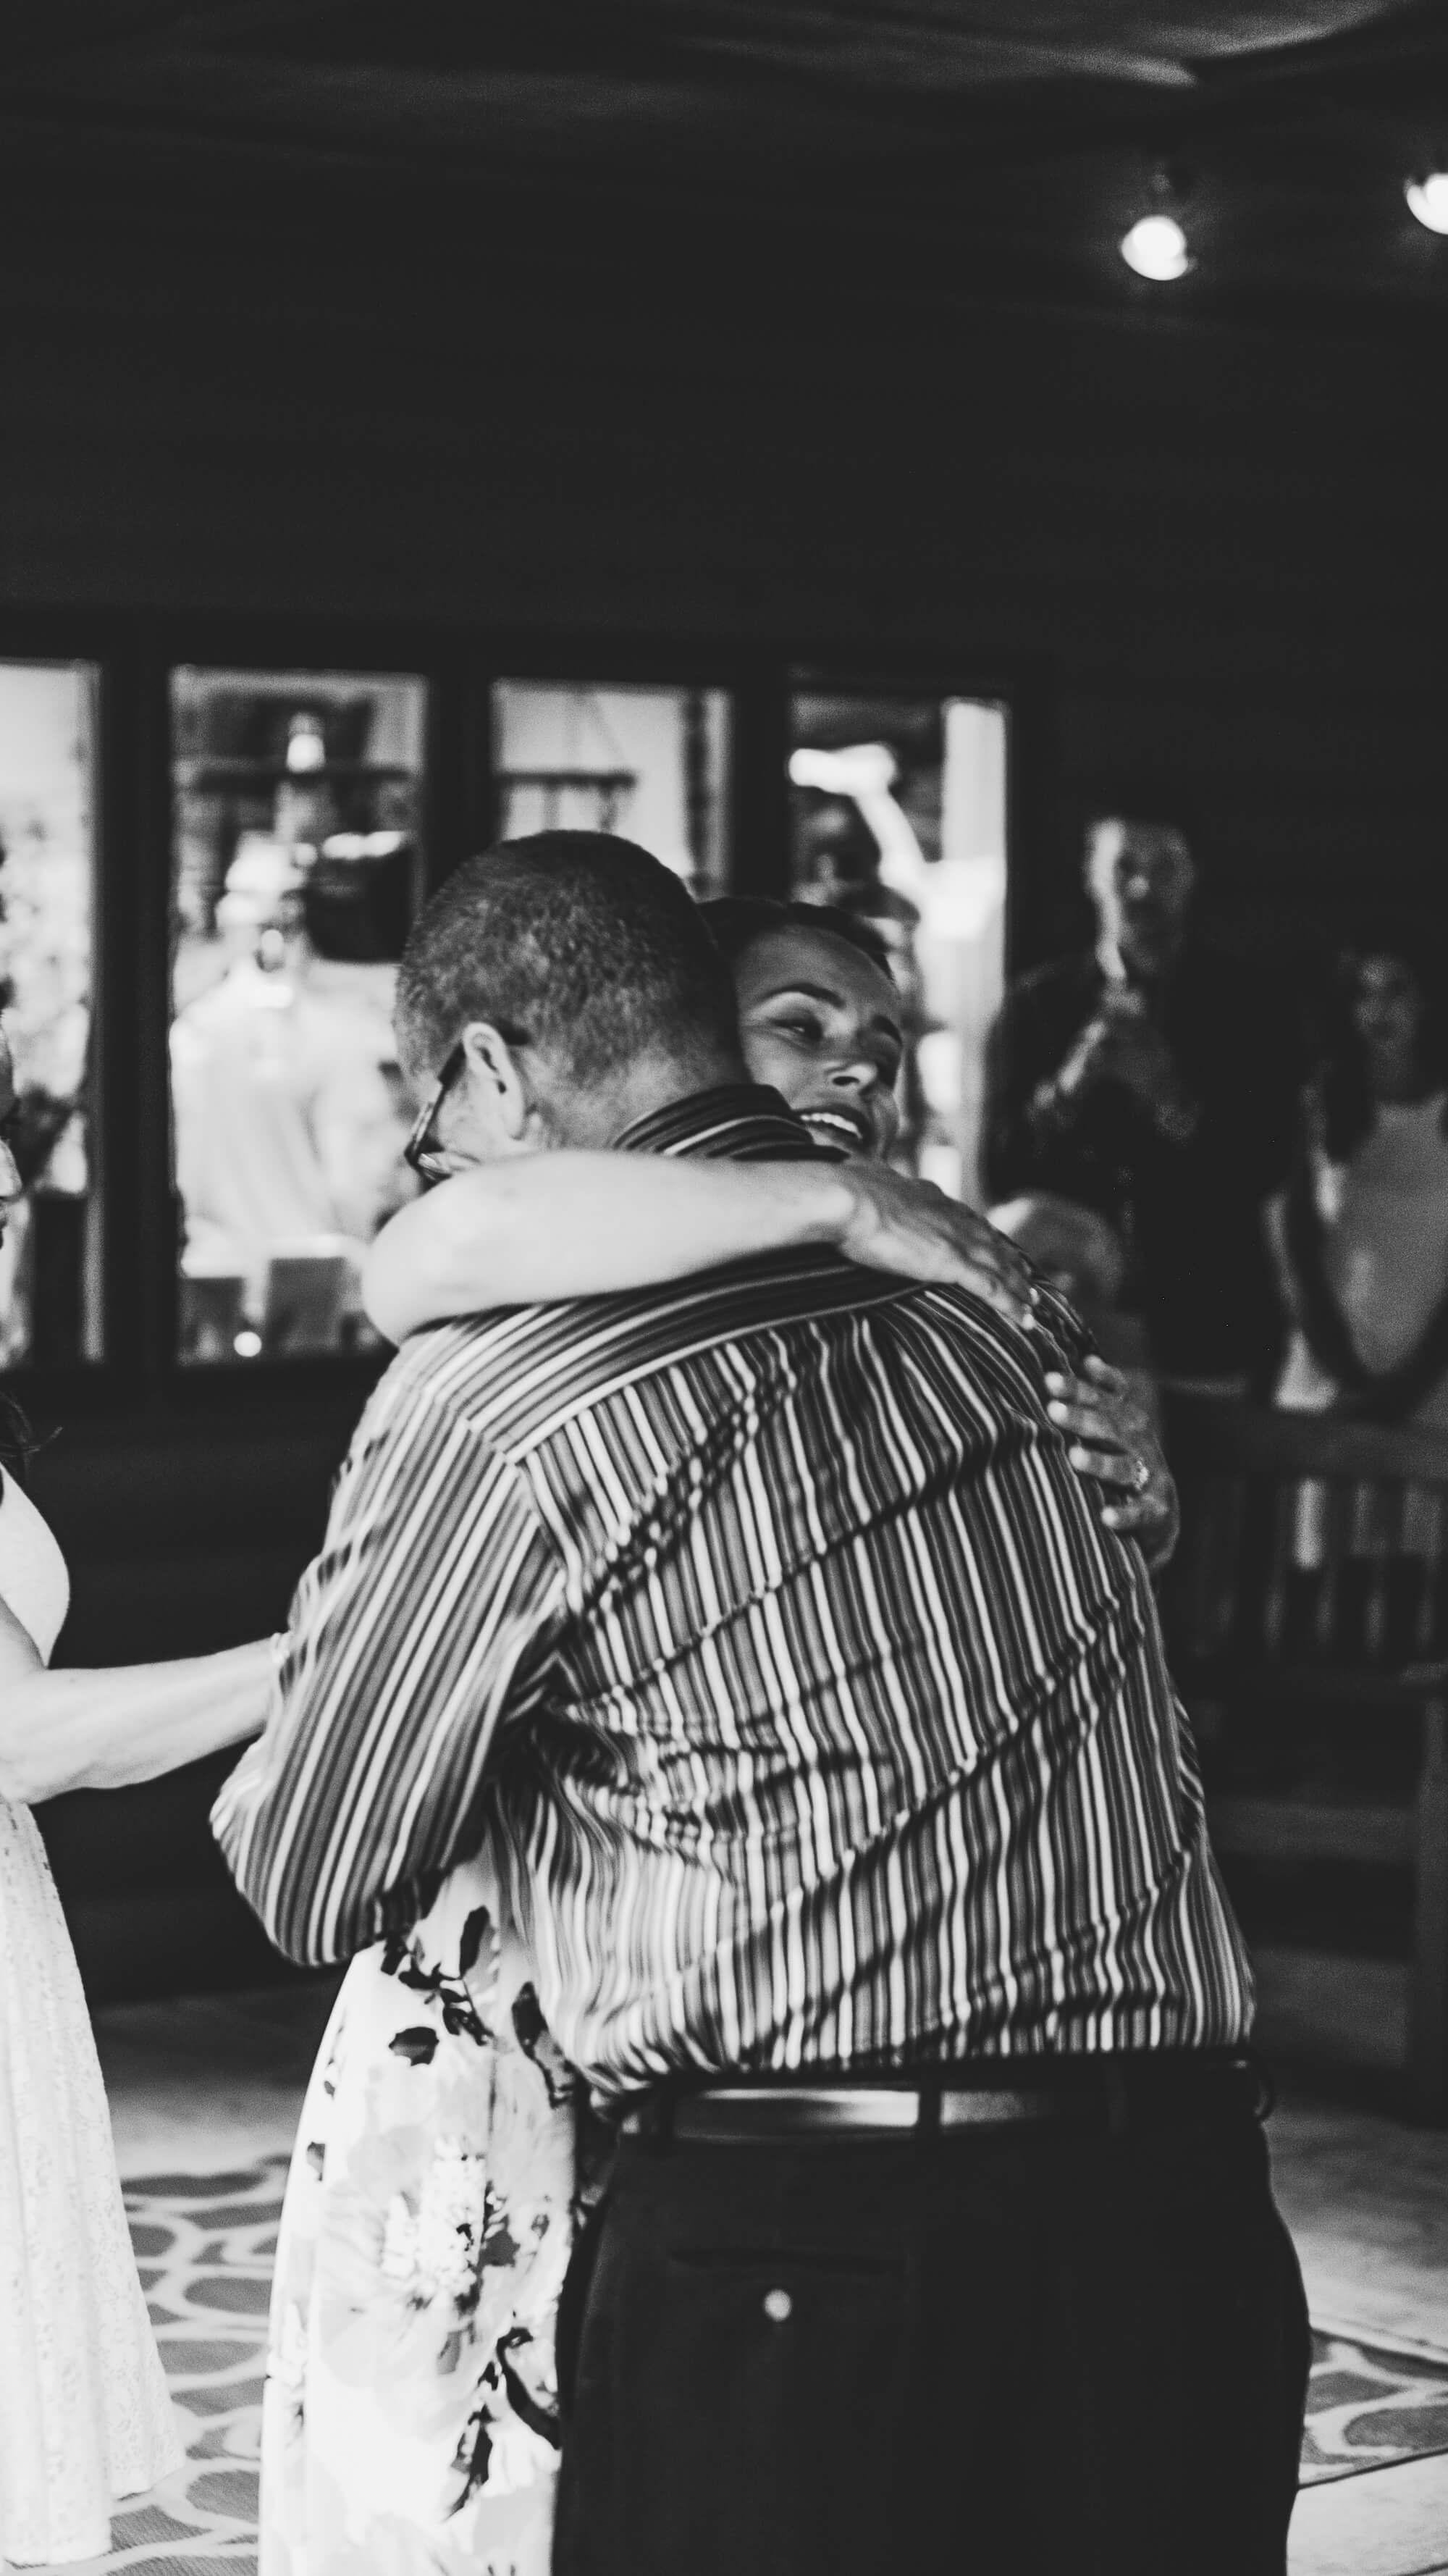 engle-olson-maddy-pat-mn-wedding-photography-16.jpg